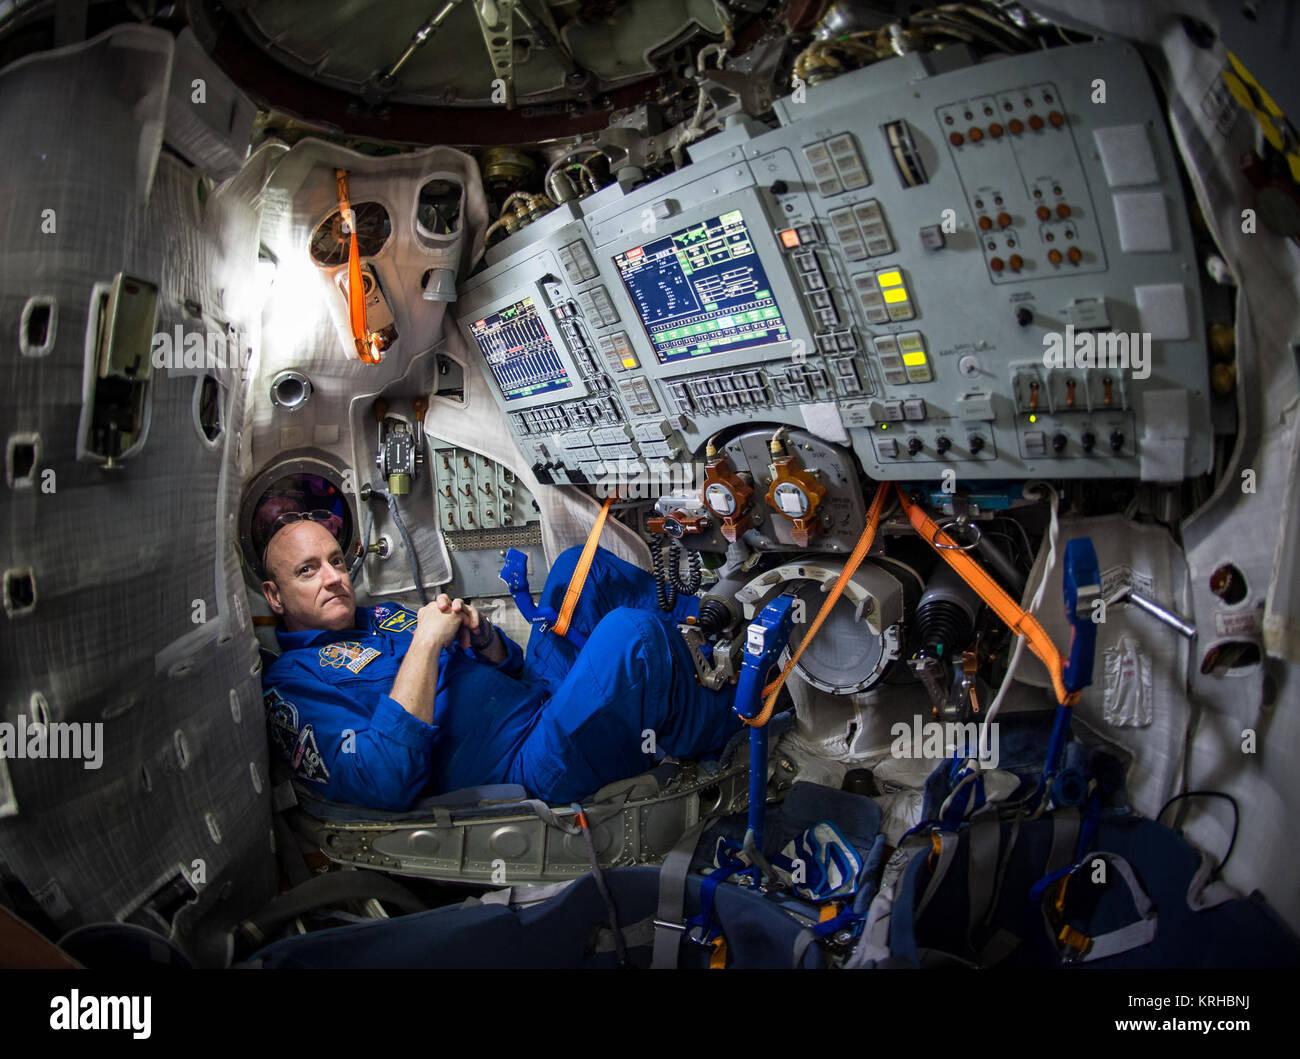 NASA Astronaut Scott Kelly is seen inside a Soyuz simulator at the Gagarin Cosmonaut Training Center (GCTC), Wednesday, - Stock Image